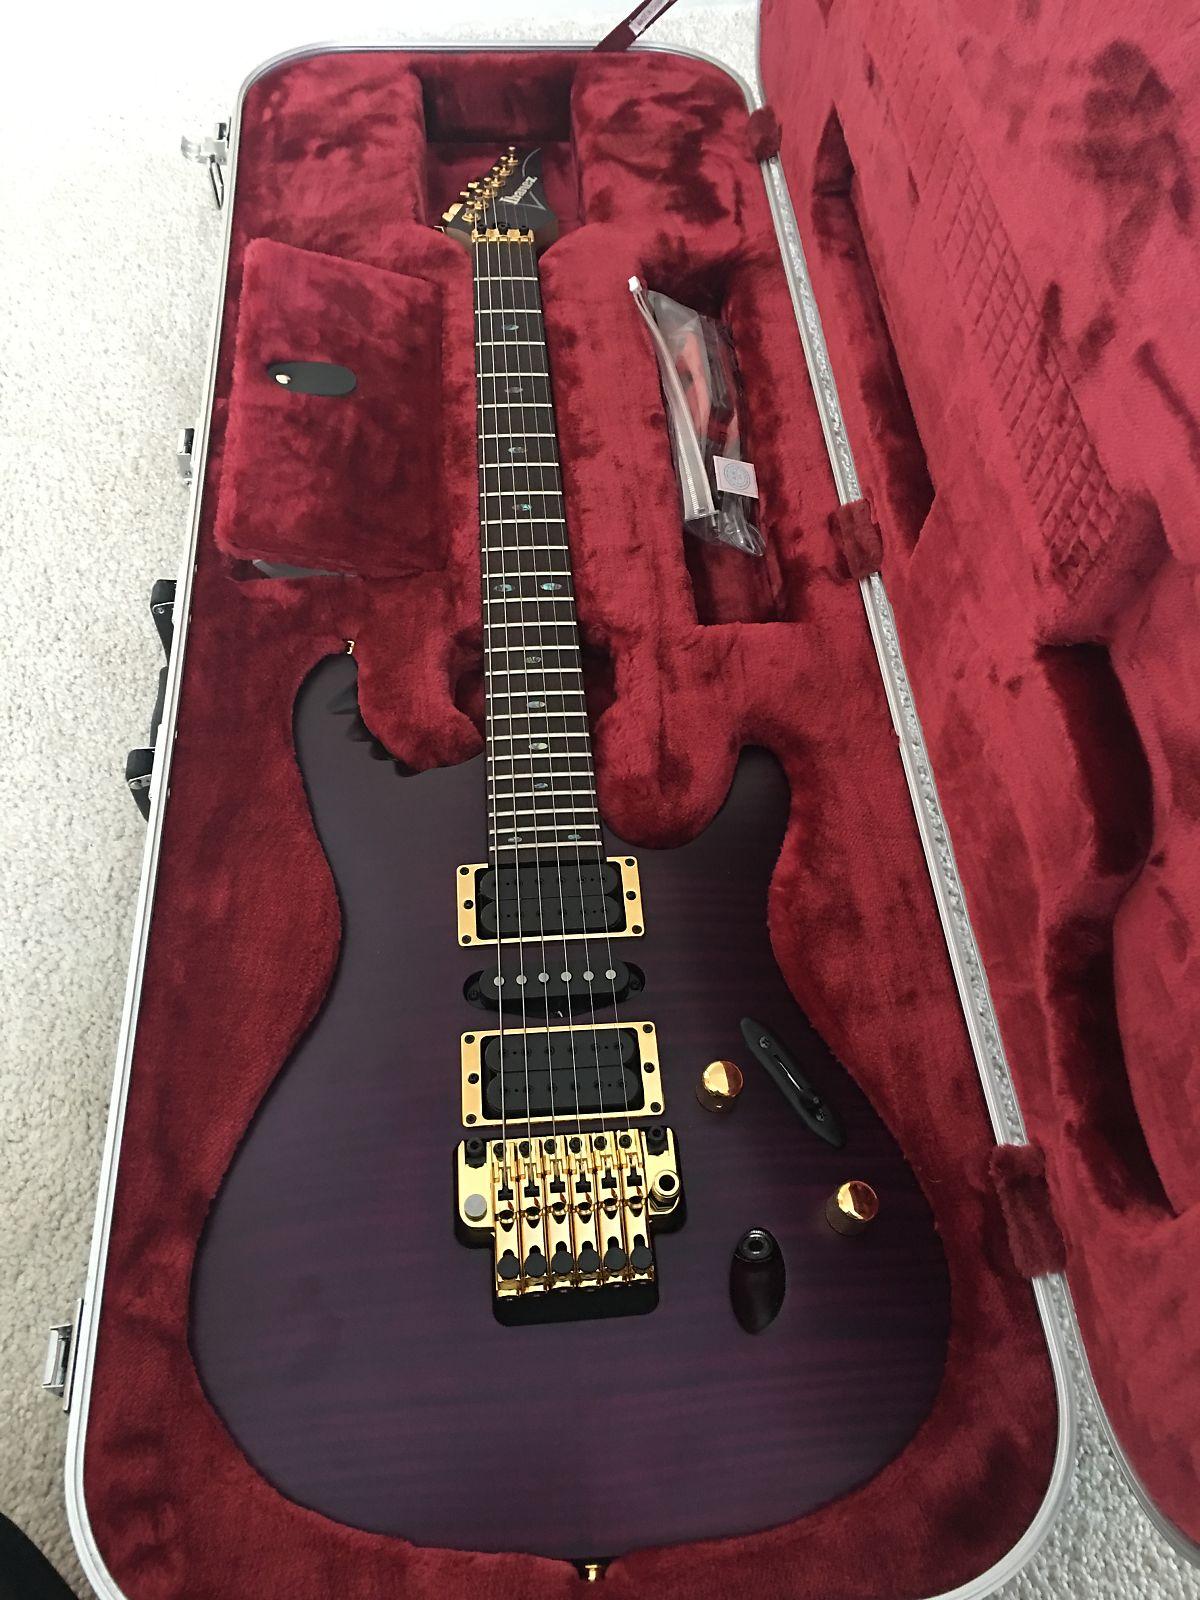 Ibanez EGEN18-TVF Herman Li Signature Series Electric Guitar Transparent on